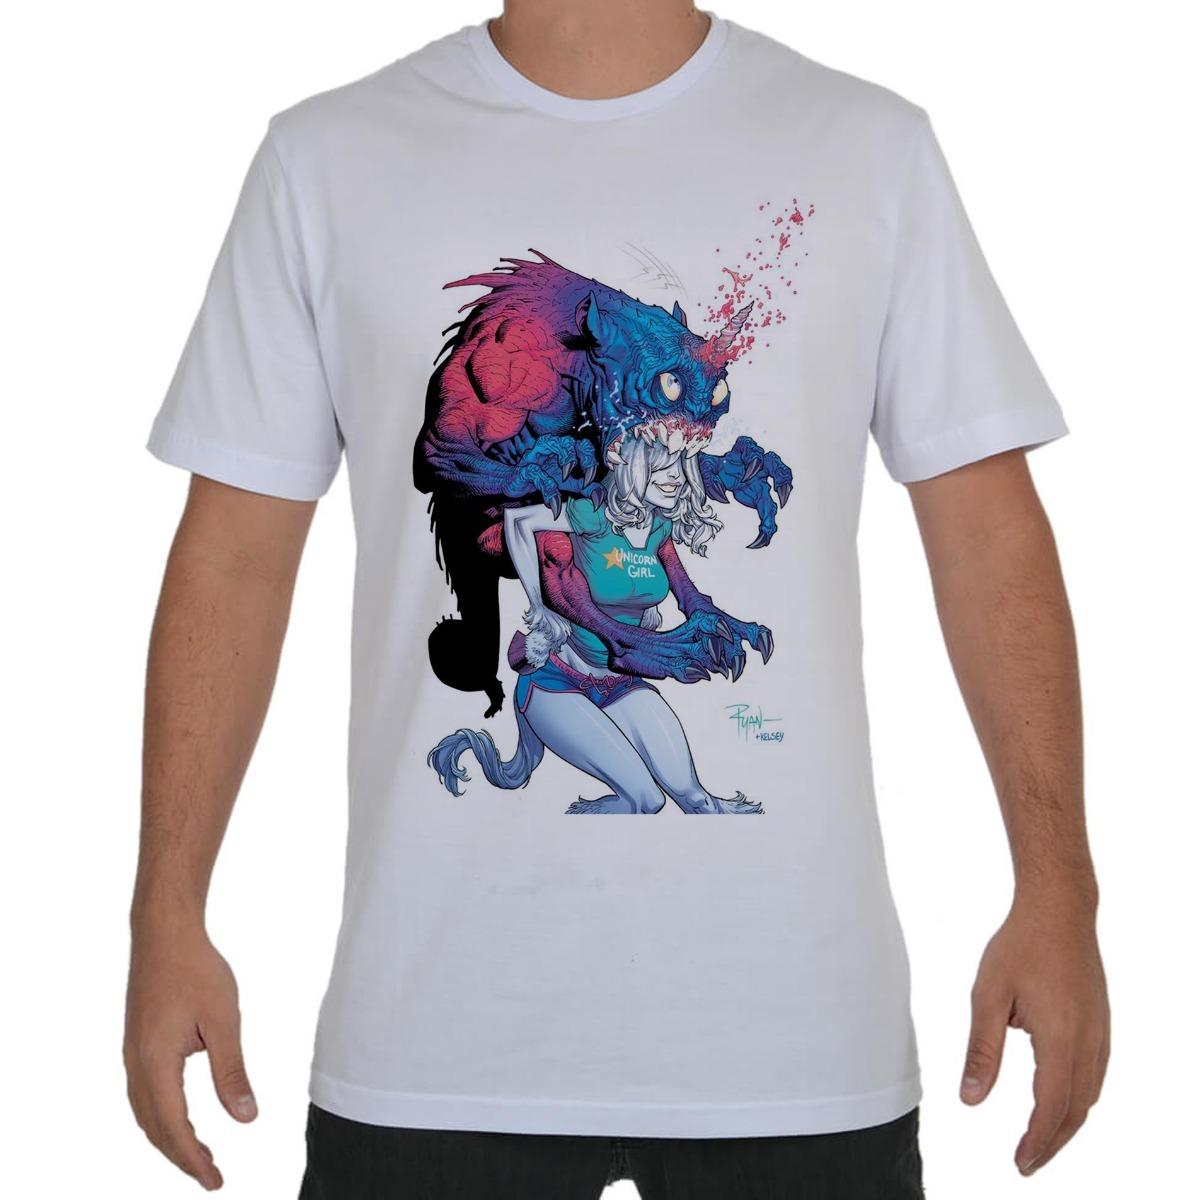 camiseta camisa beast fera mulher swag psico sexy n.2593. Carregando zoom. 321c0864abd